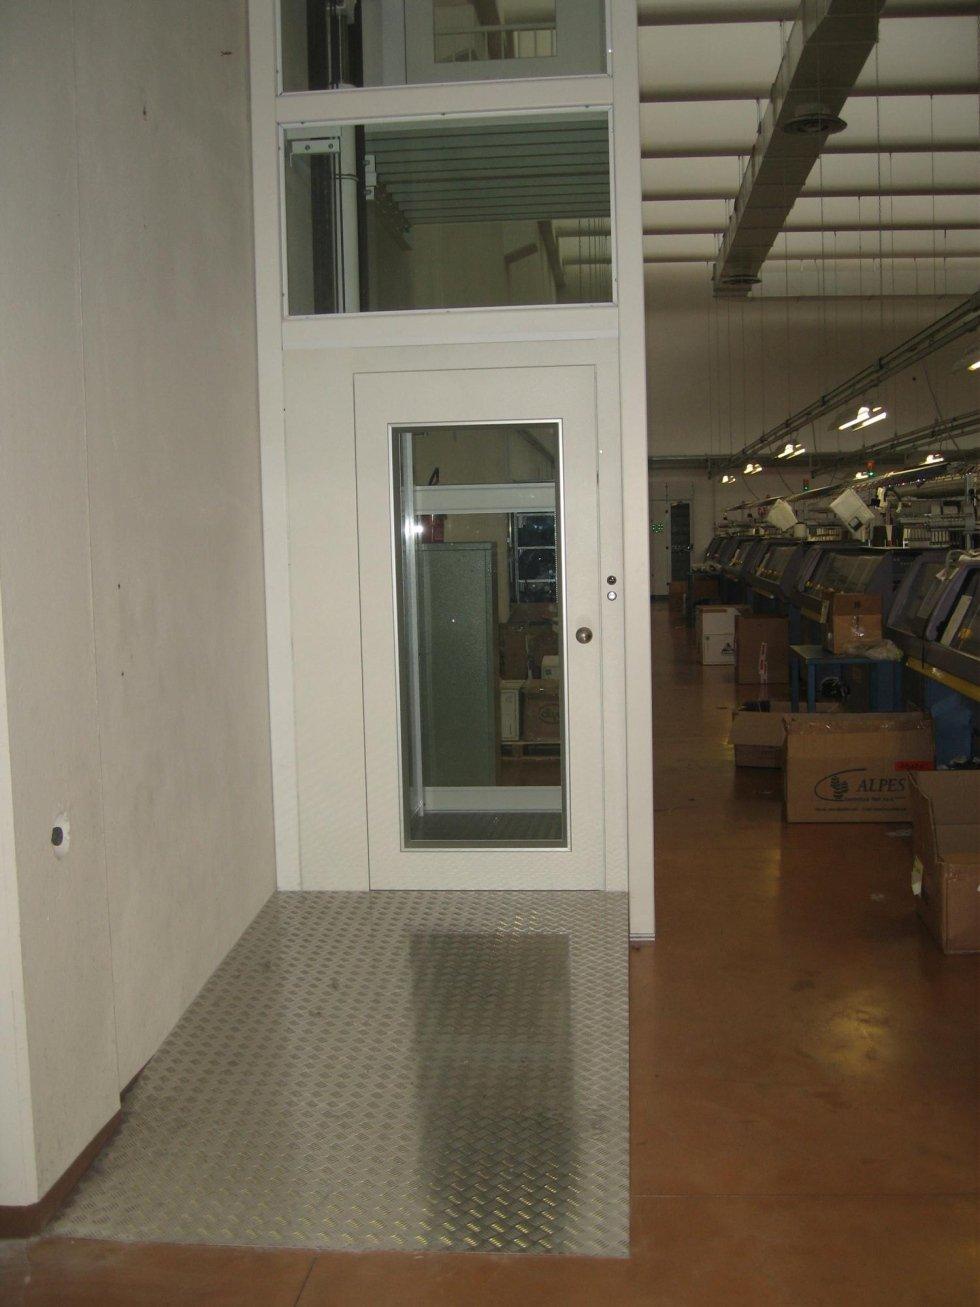 piattaforma elevatrice oleodinamica in una fabbrica